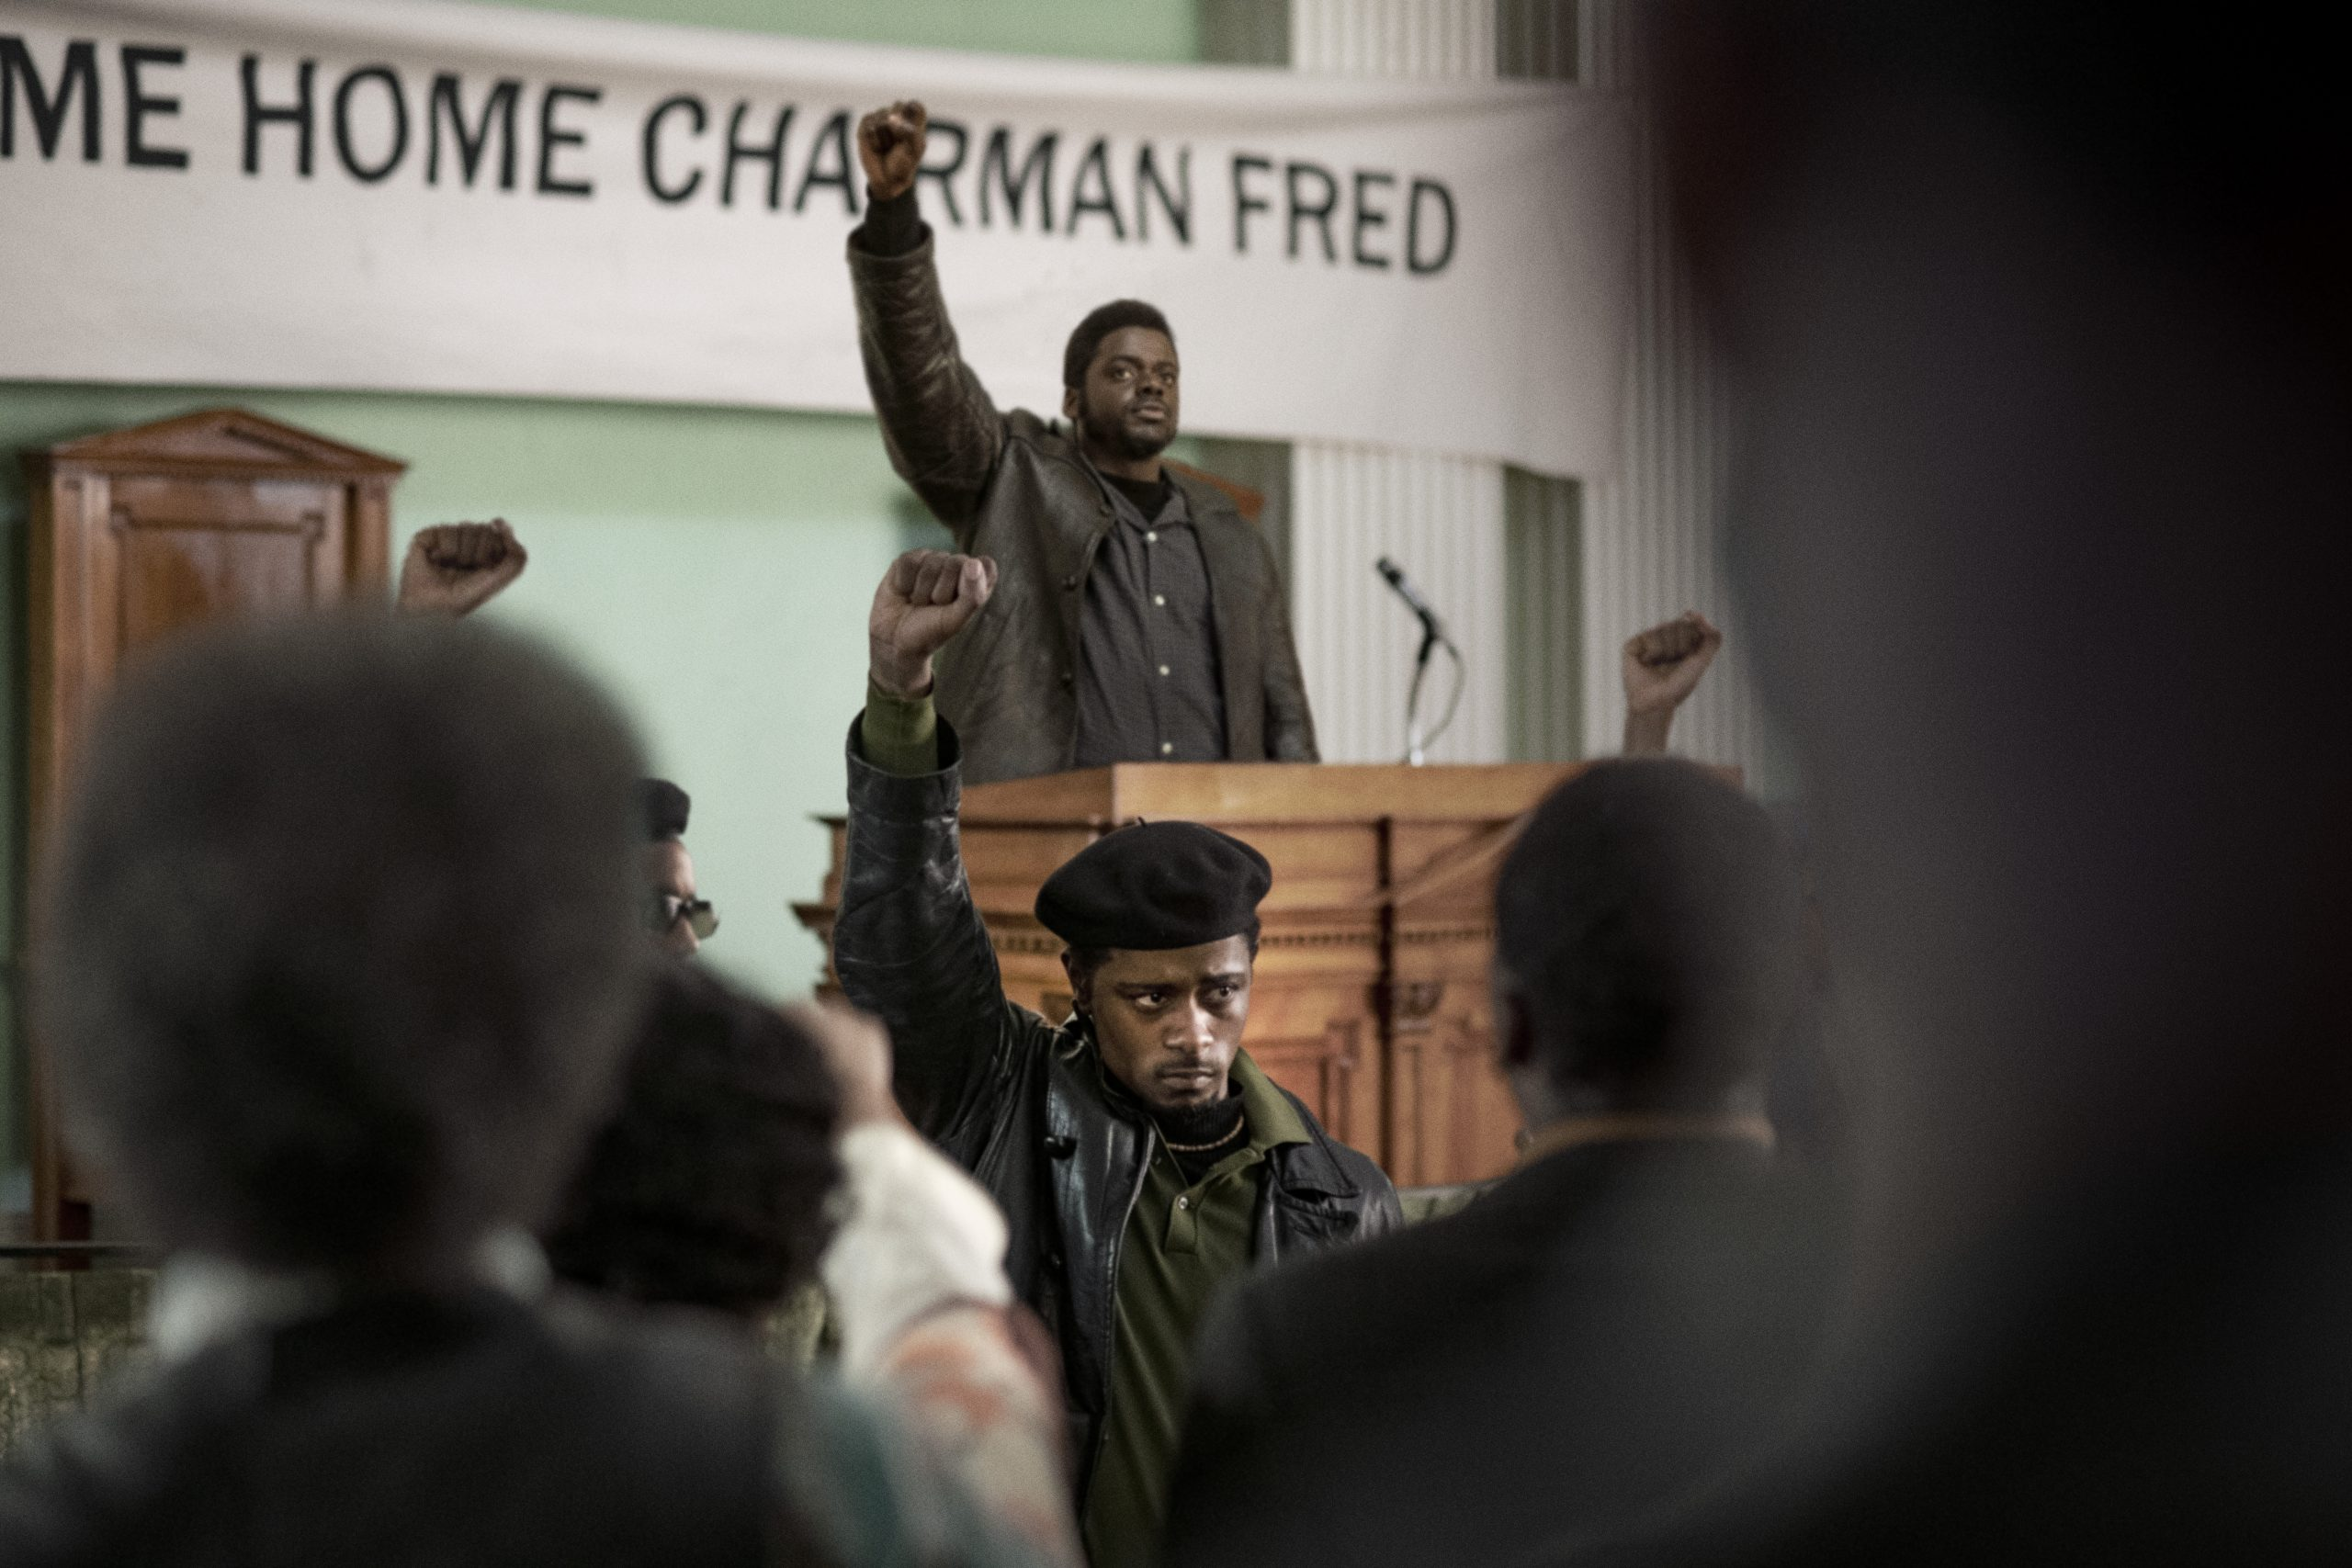 First Look: JUDAS AND THE BLACK MESSIAH Starring Daniel Kaluuya